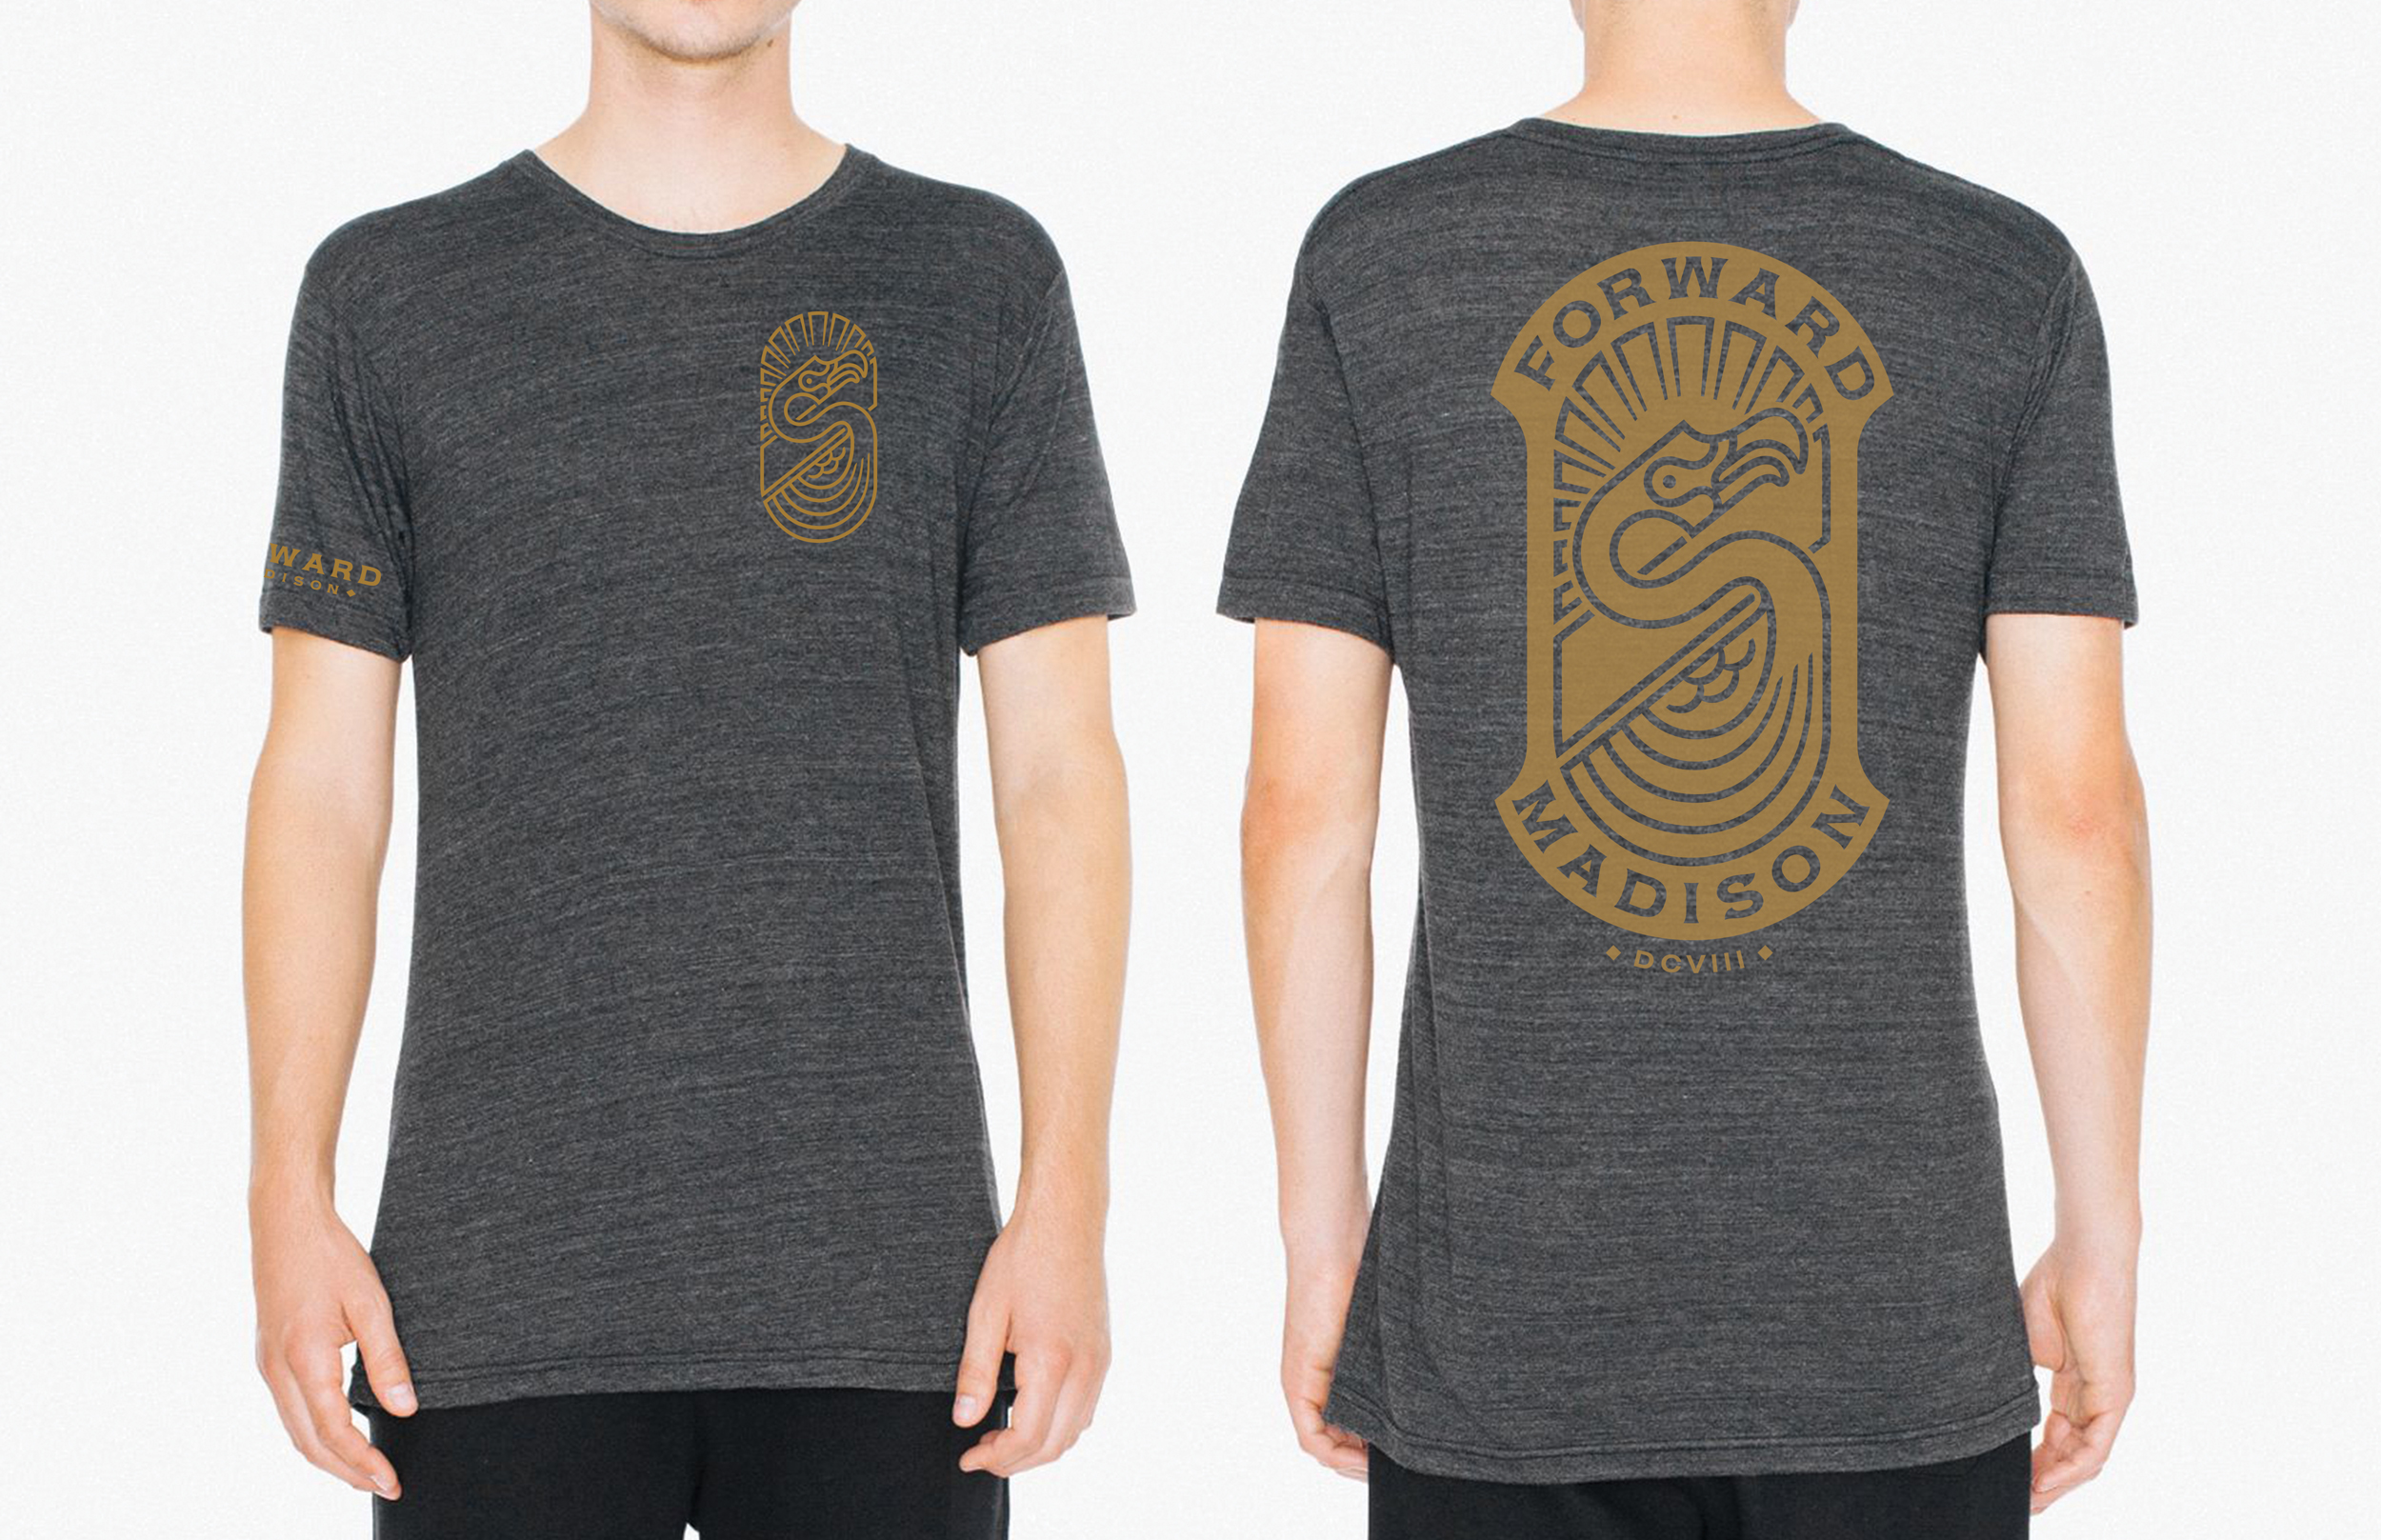 FMFC-shirts_01.jpg